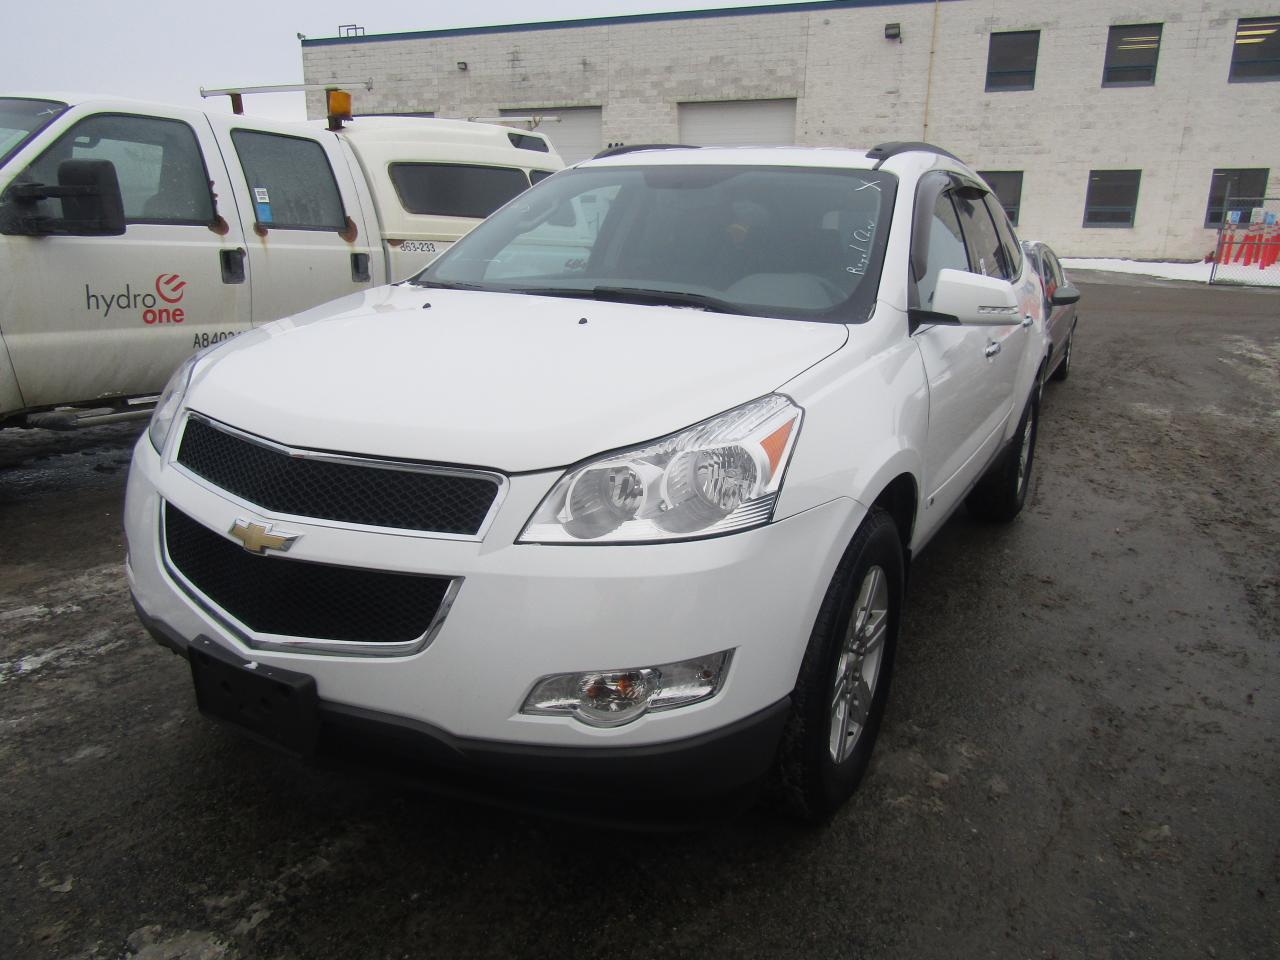 Photo of White 2010 Chevrolet Traverse